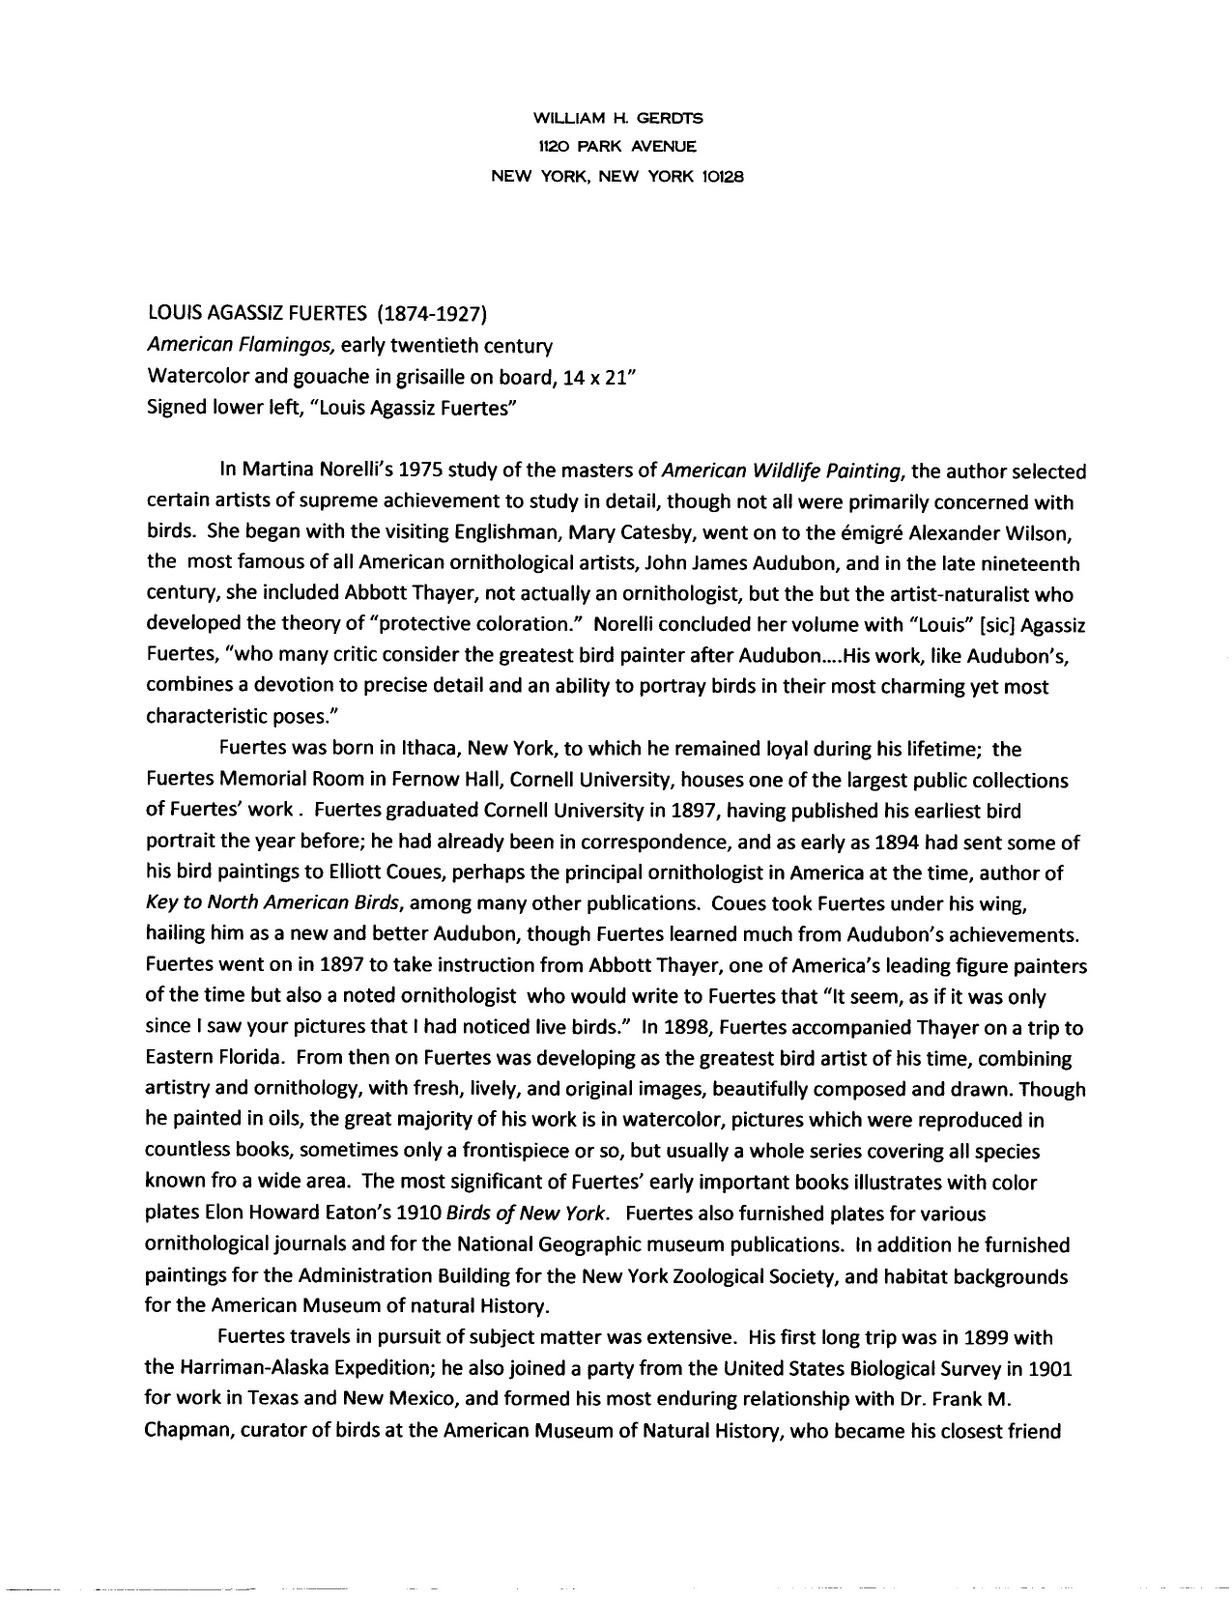 essay best teacher business letter essay ex letter formal  personal statement professional professional essay format samples teacher aide cover letter professional essay format samples teacher